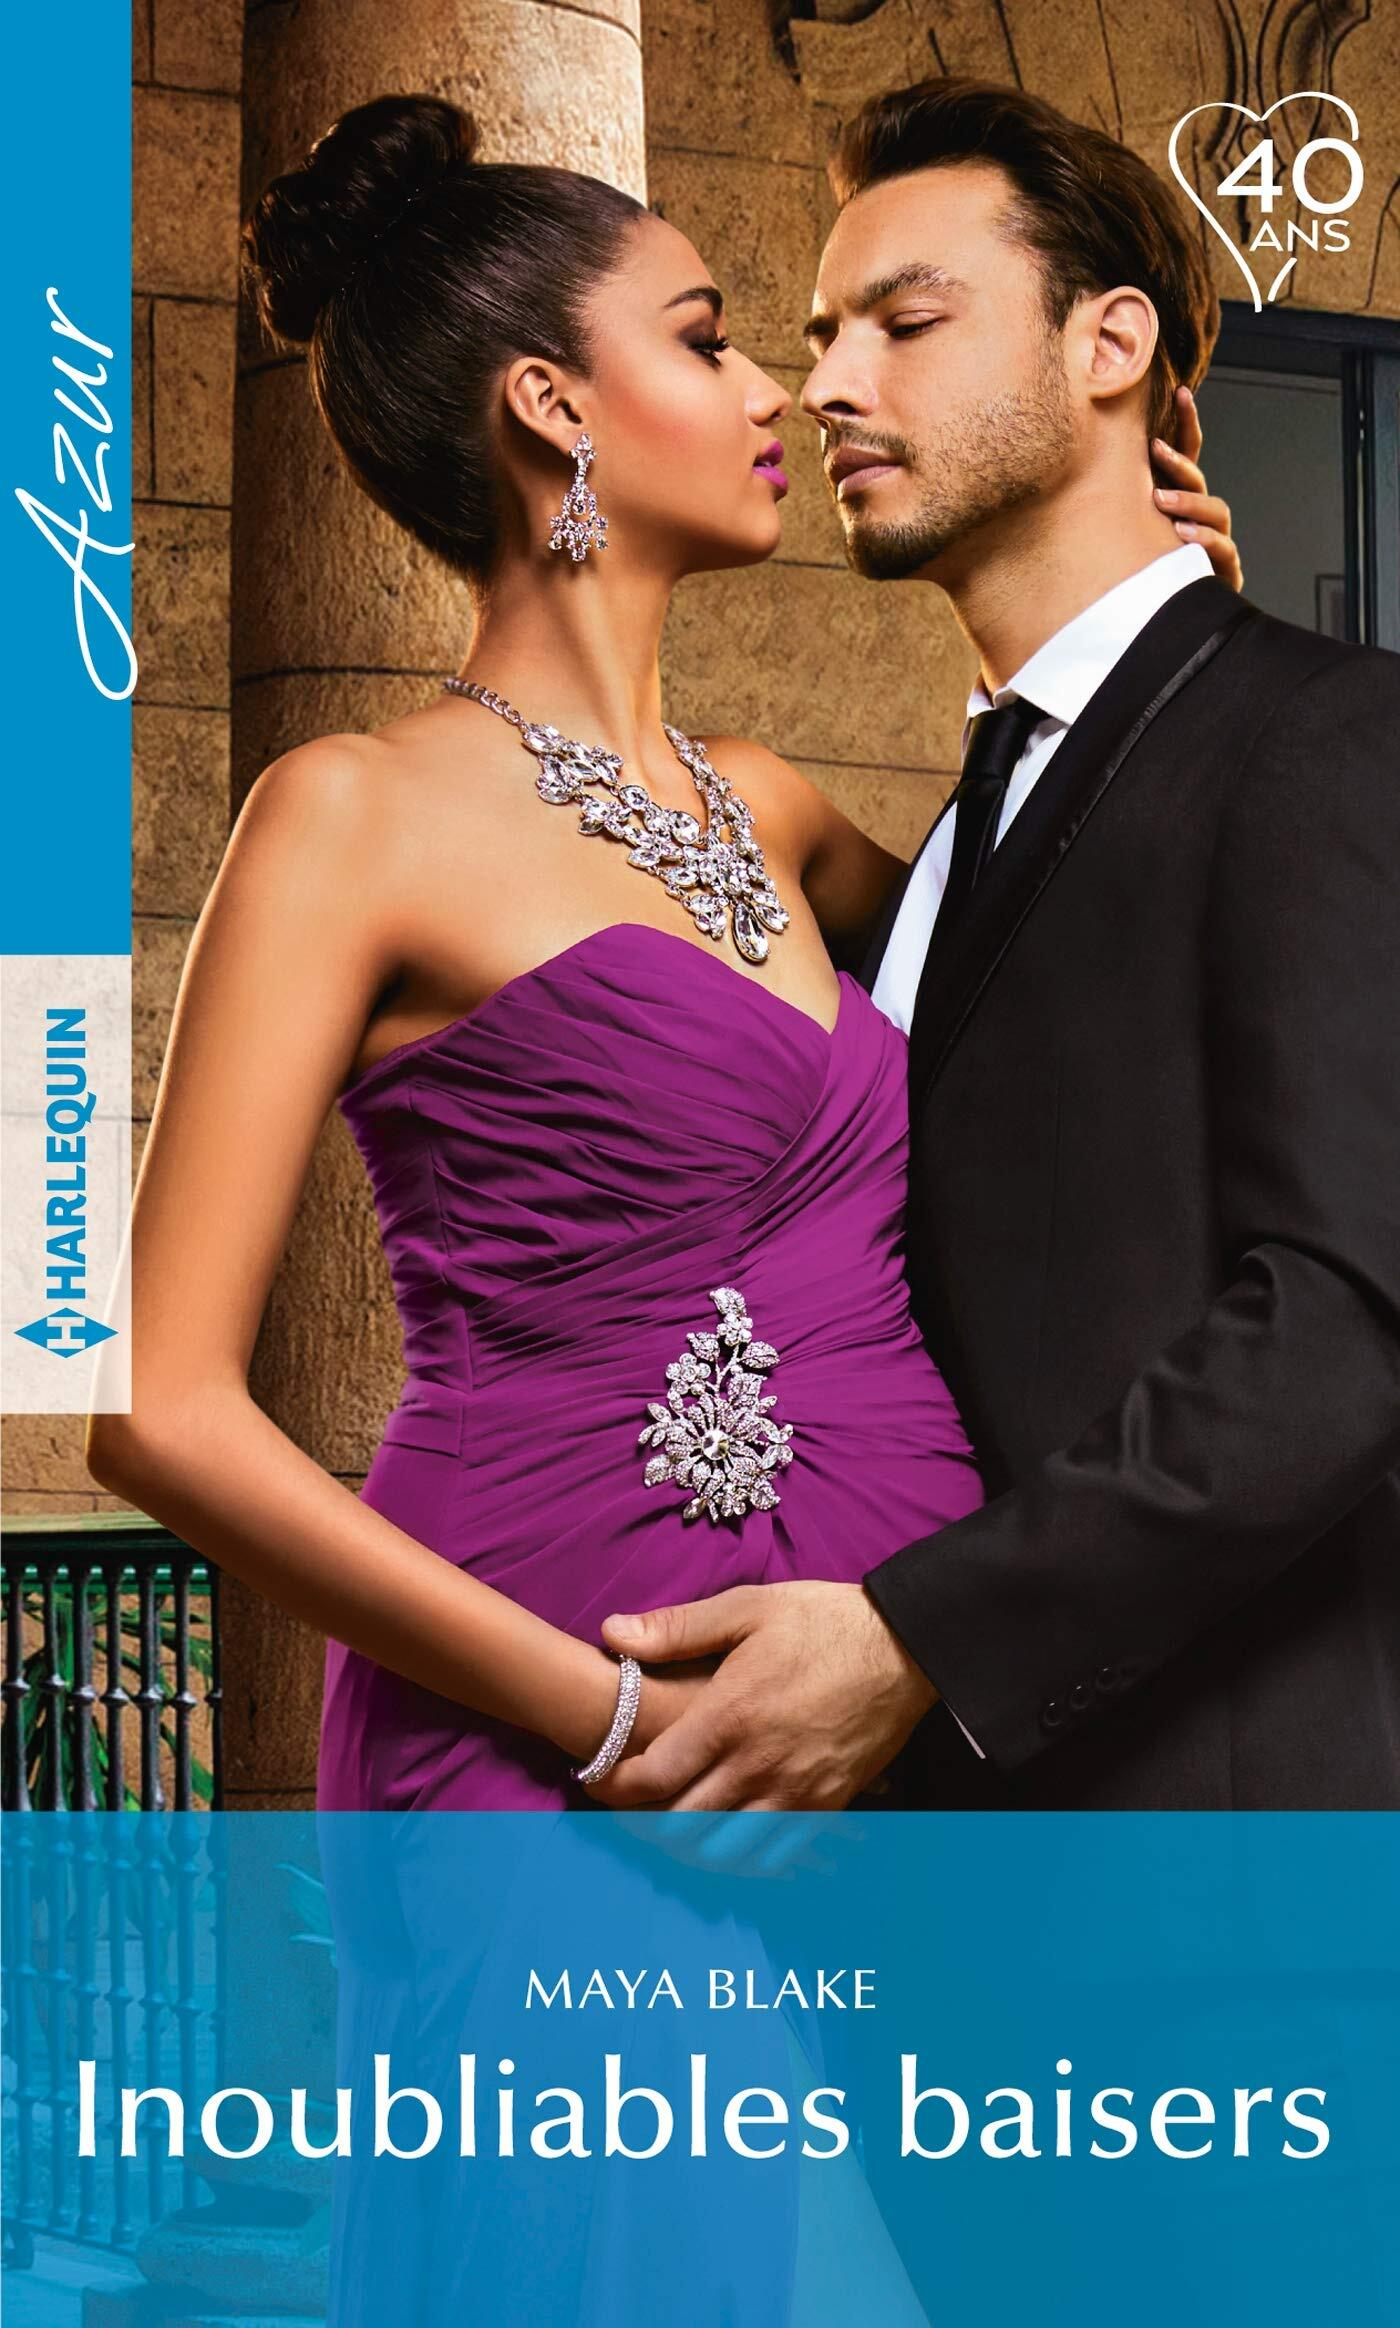 cdn1.booknode.com/book_cover/1117/full/inoubliables-[censuré]rs-1116978.jpg